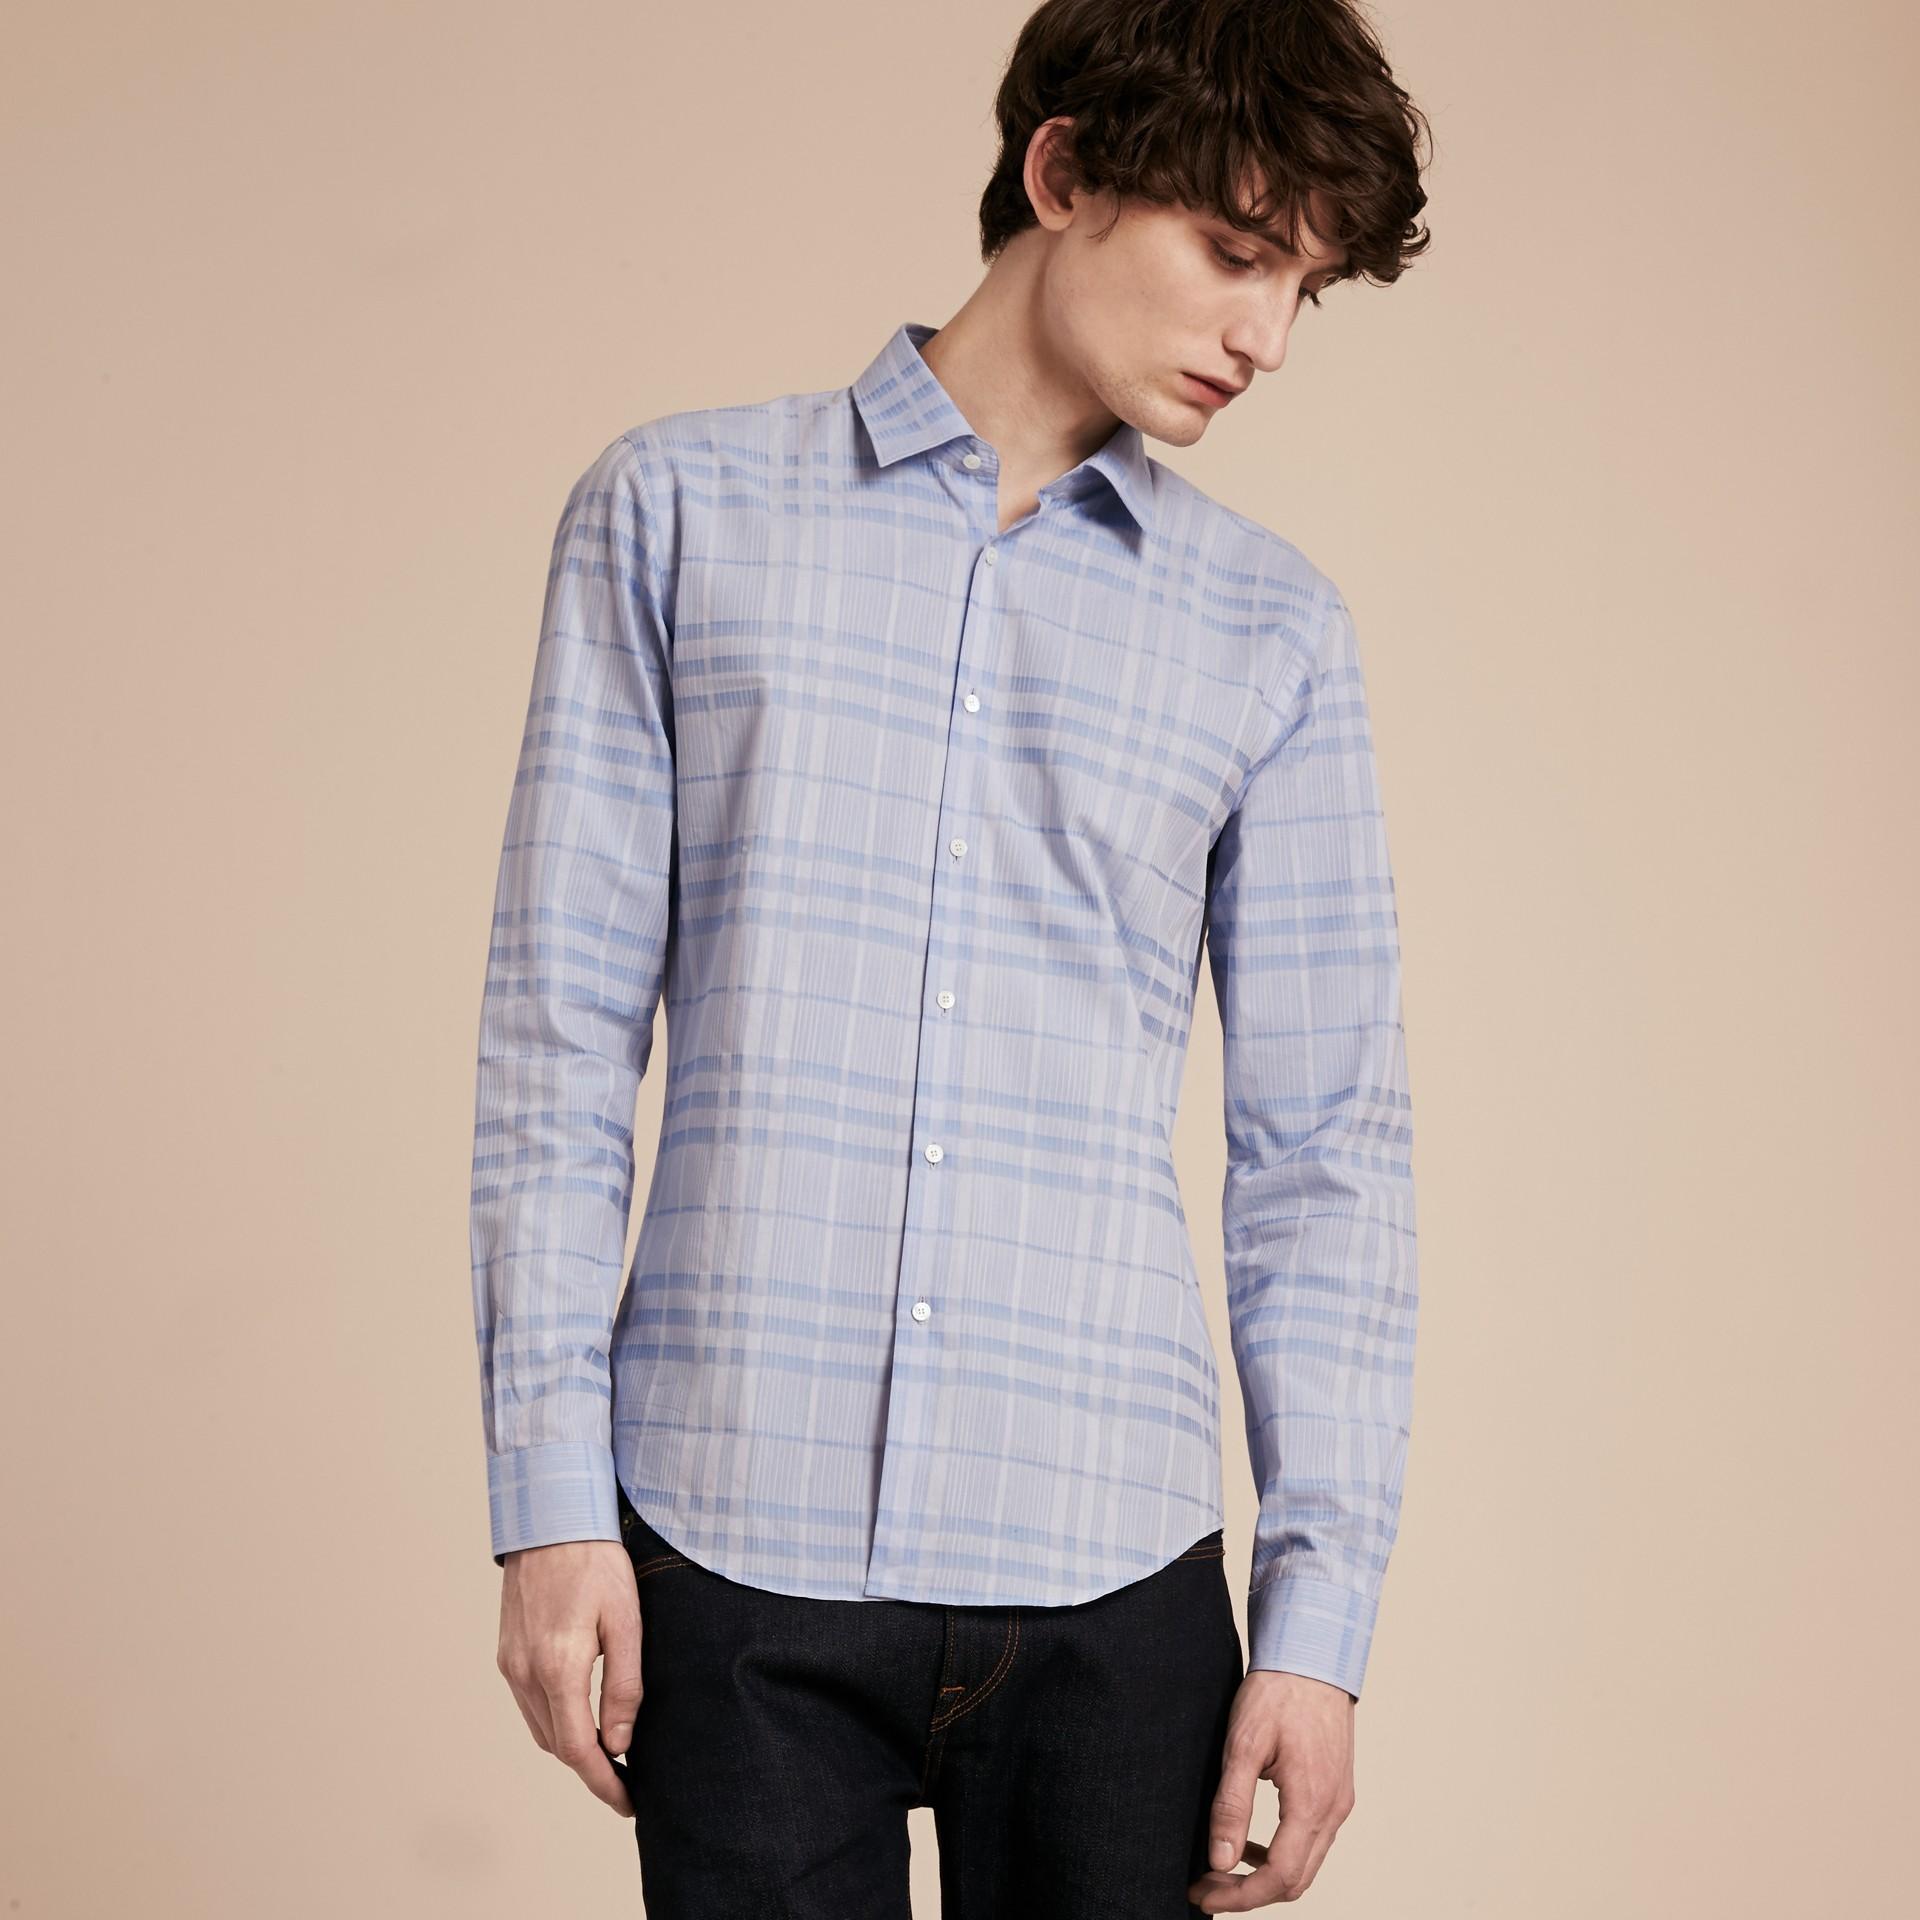 City blue Check Jacquard Cotton Shirt City Blue - gallery image 6